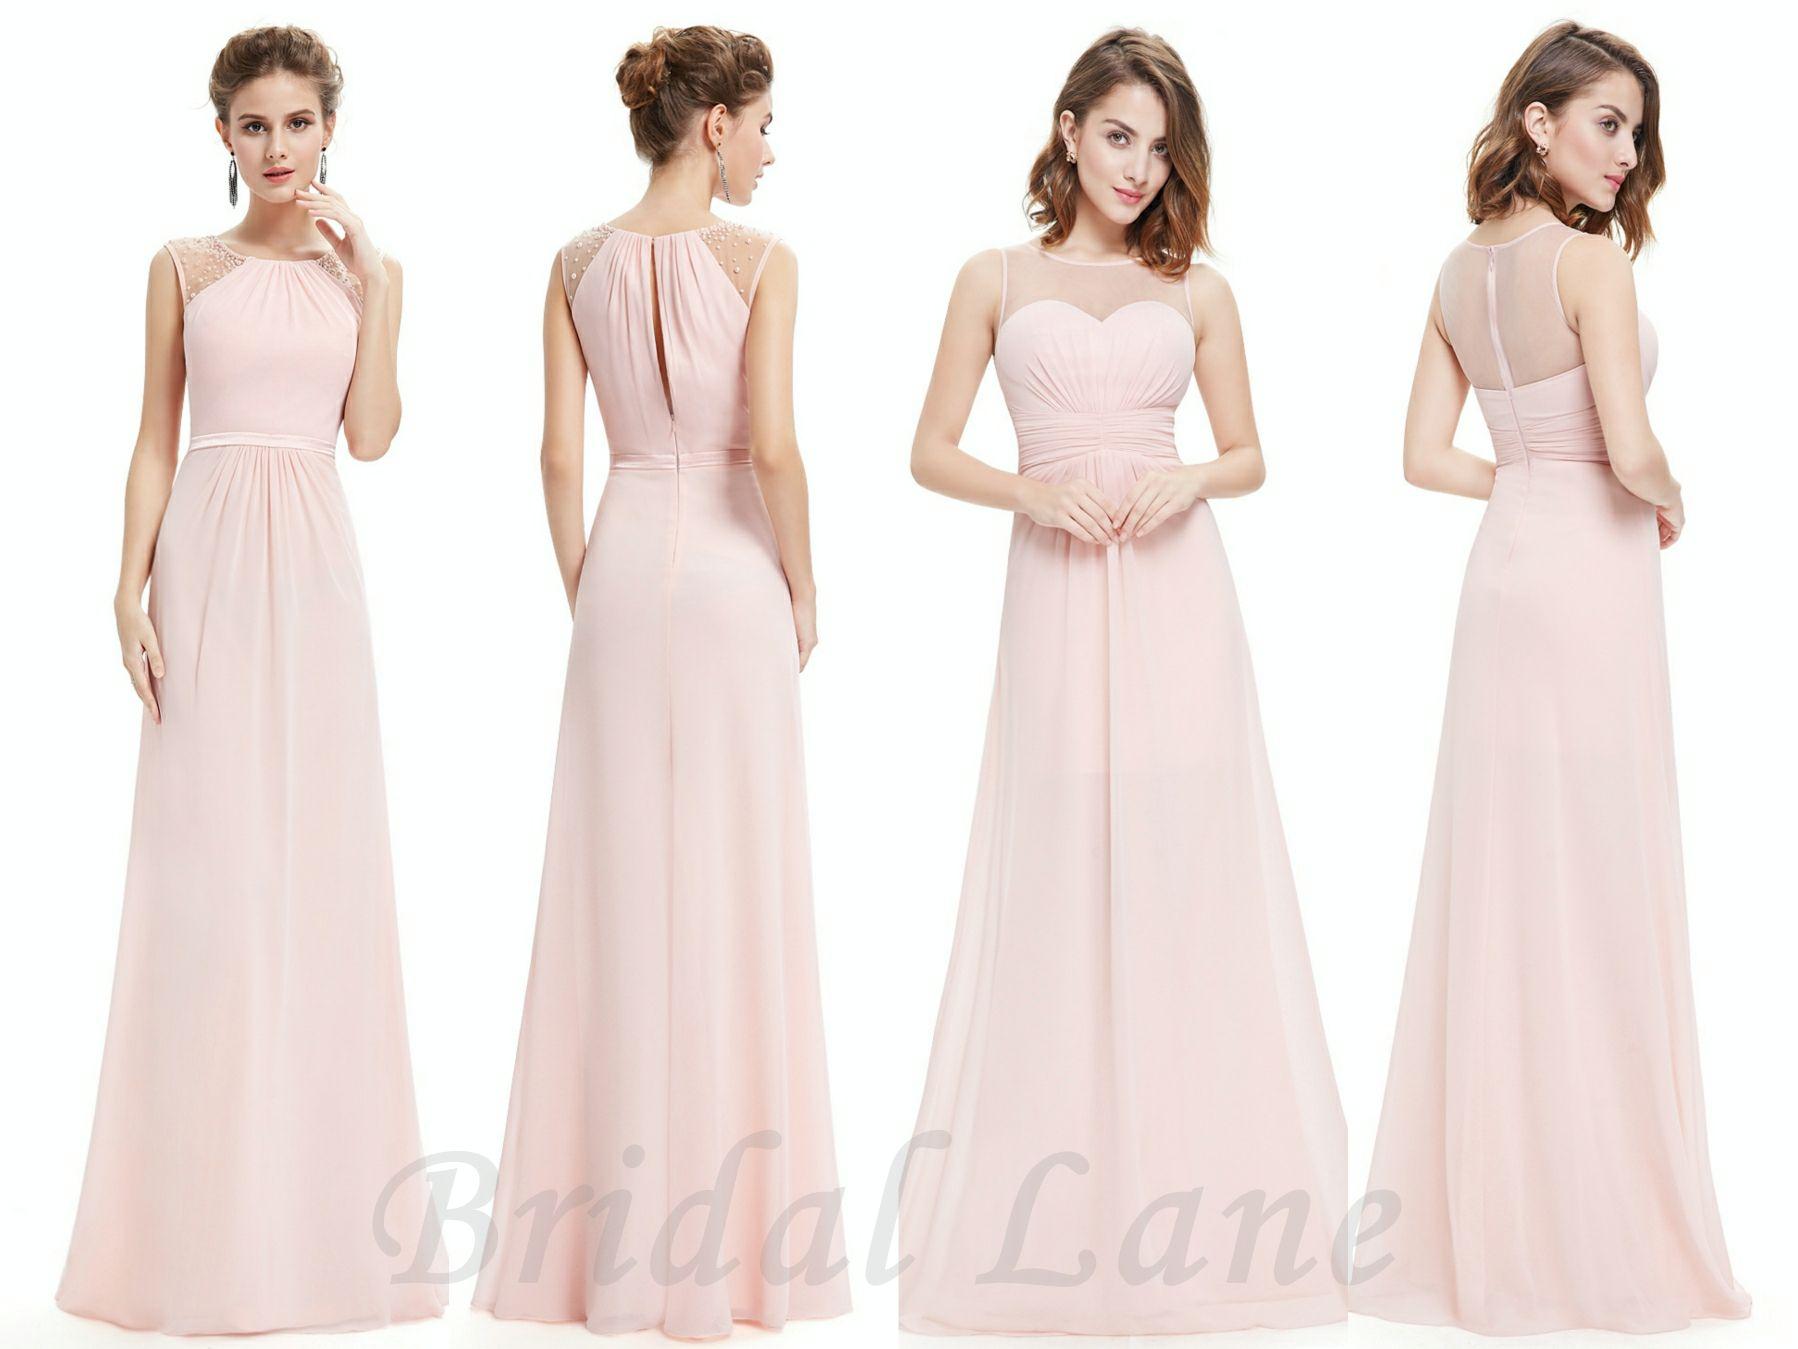 Blush pink bridesmaid dresses - Cape Town. | Bridesmaid Dresses - at ...